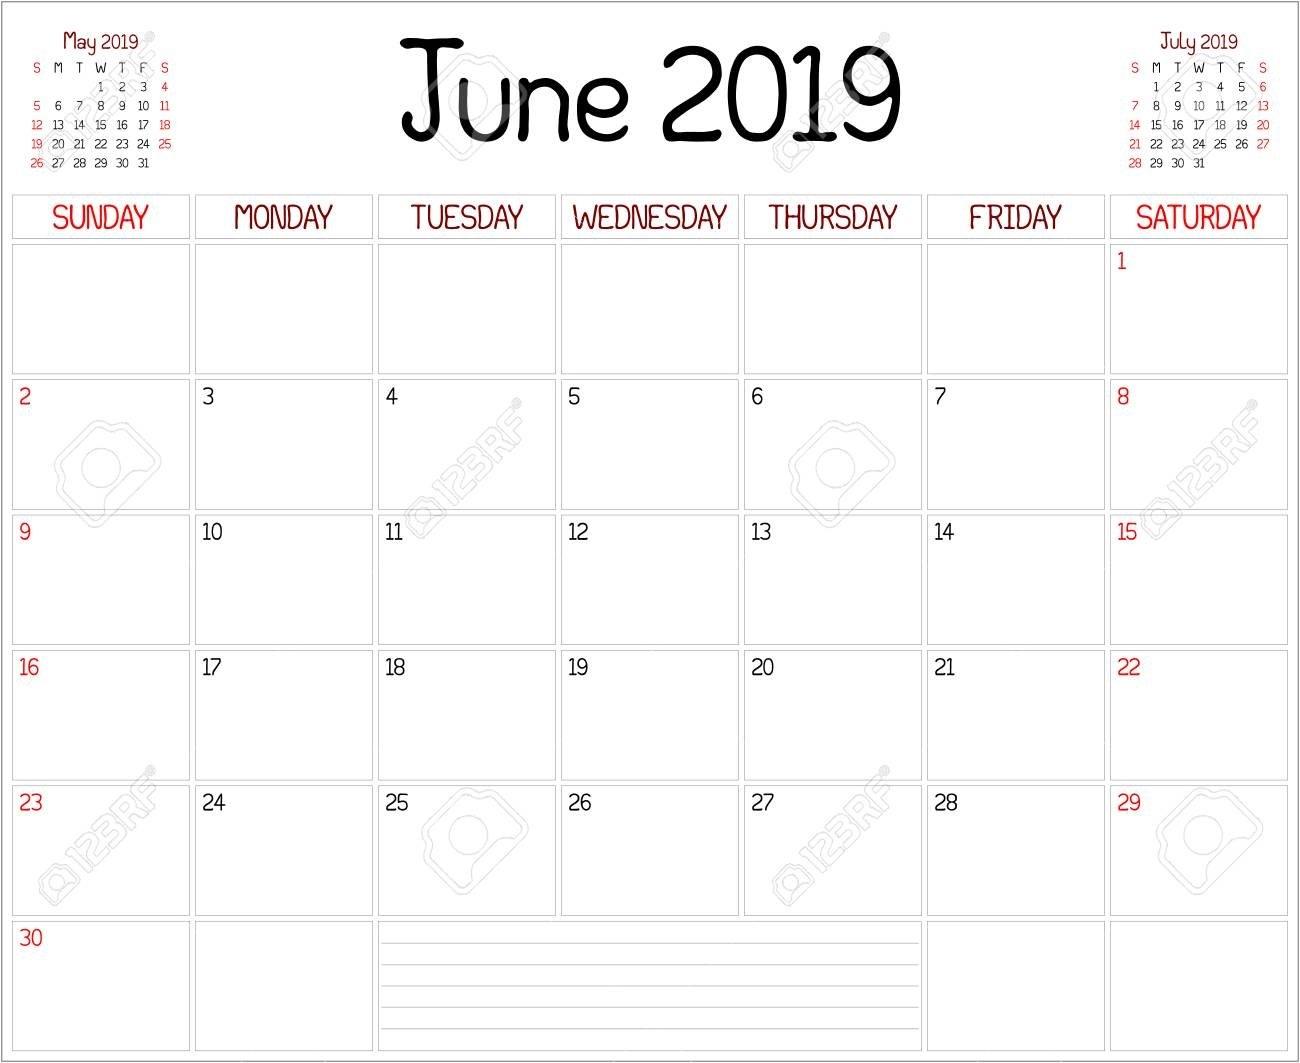 Year 2019 June Planner - A Monthly Planner Calendar For June 9/2019 Calendar